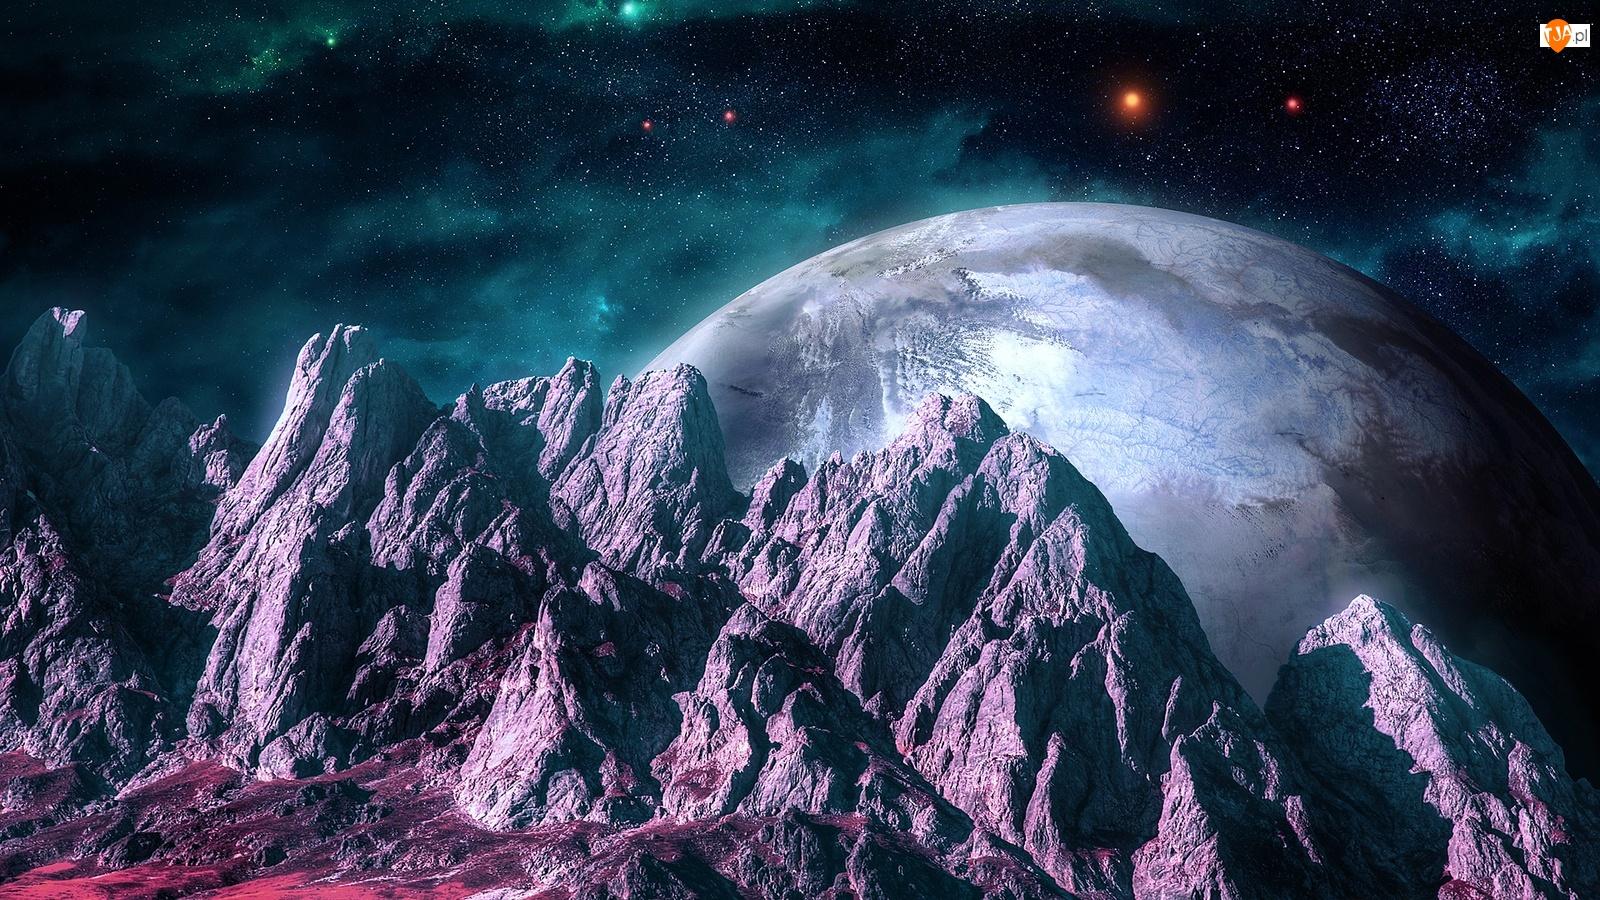 Skały, Kosmos, Planeta